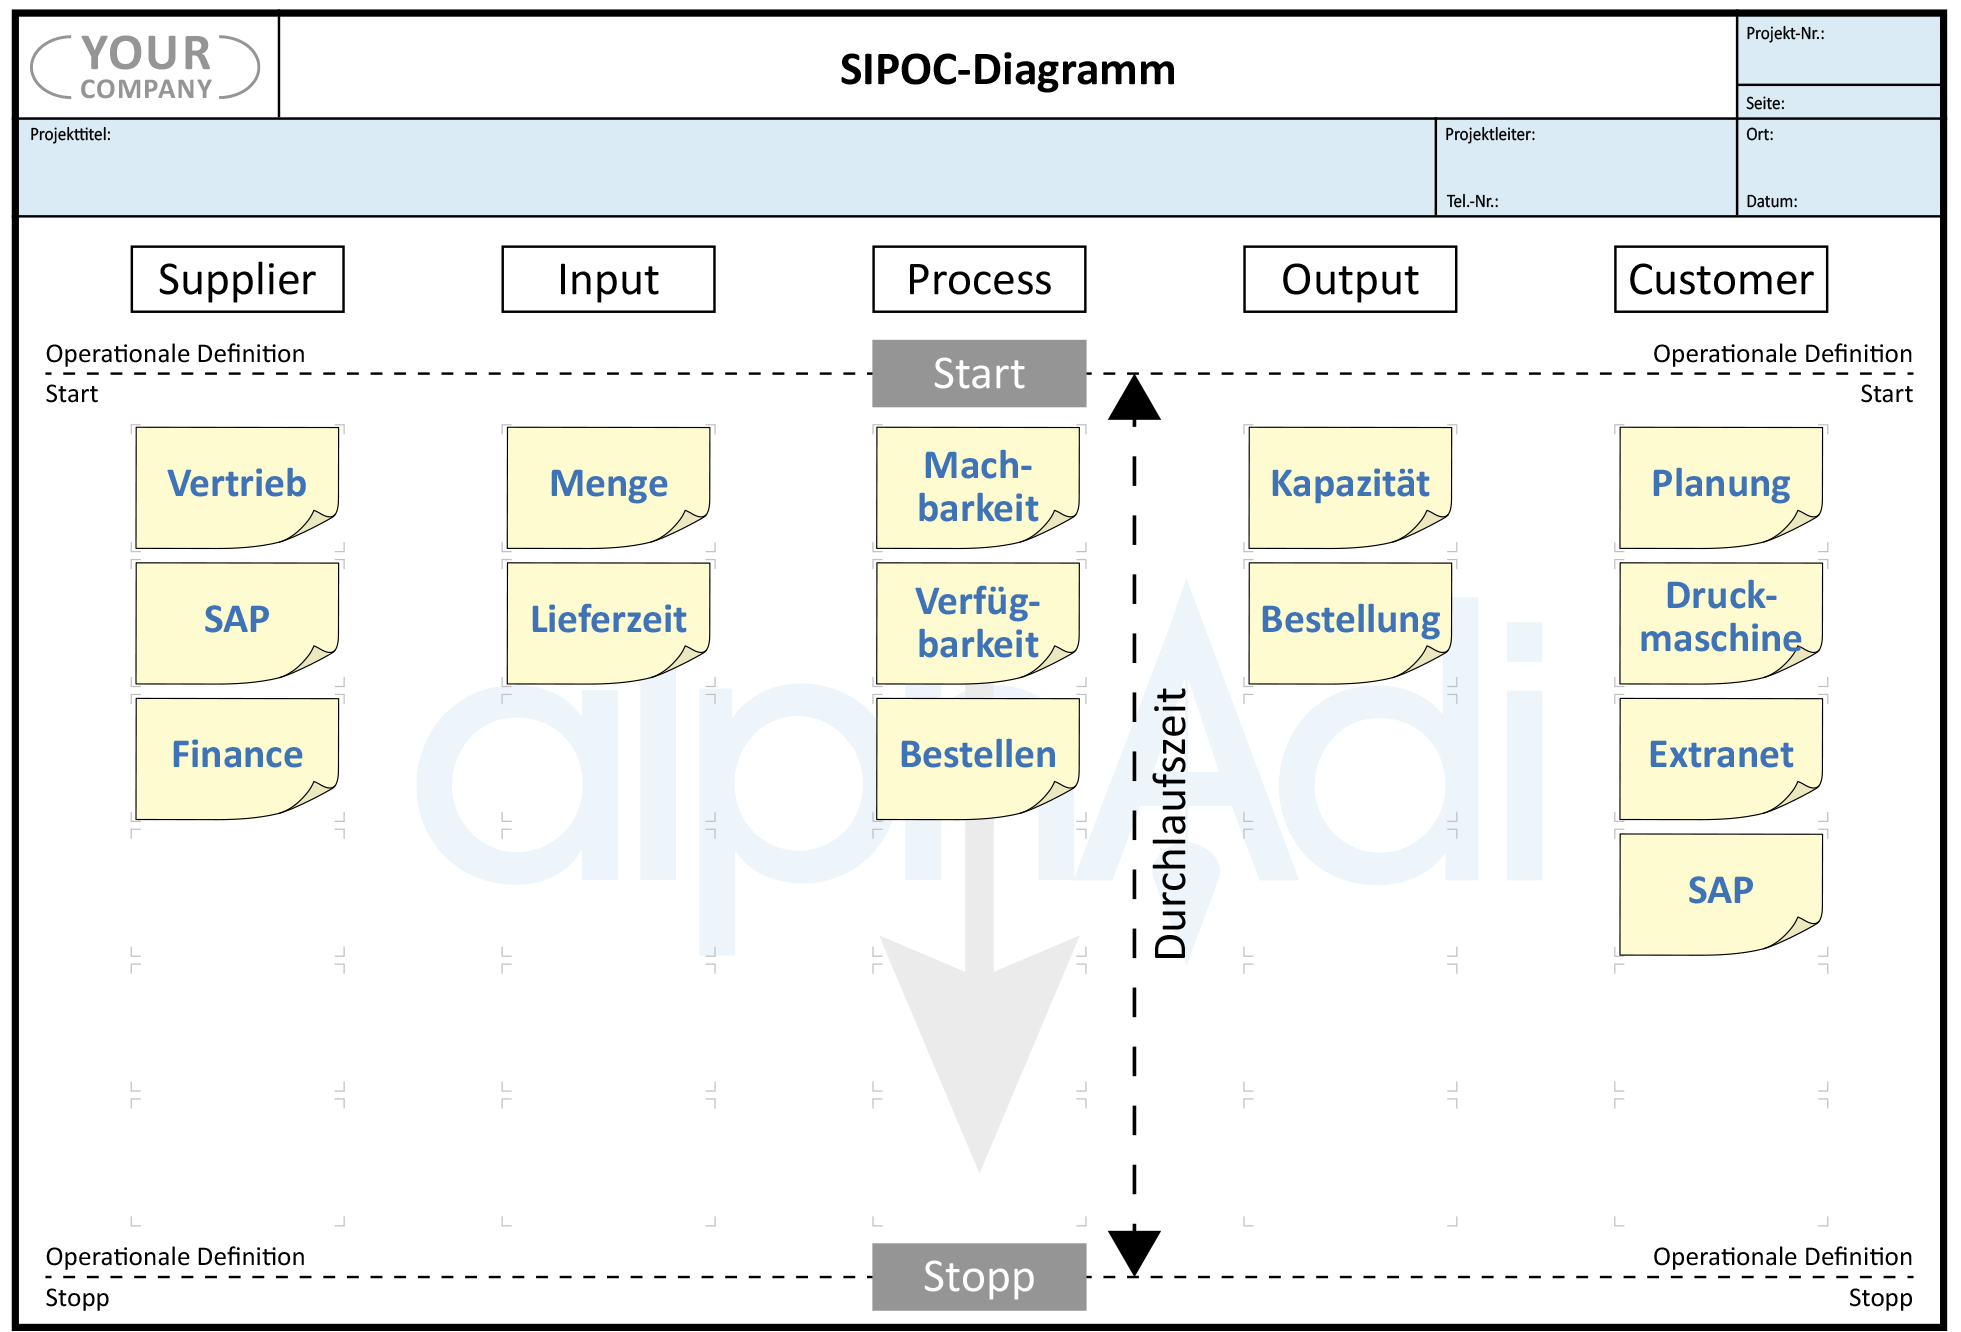 SIPOC Diagramm Lean Six Sigma